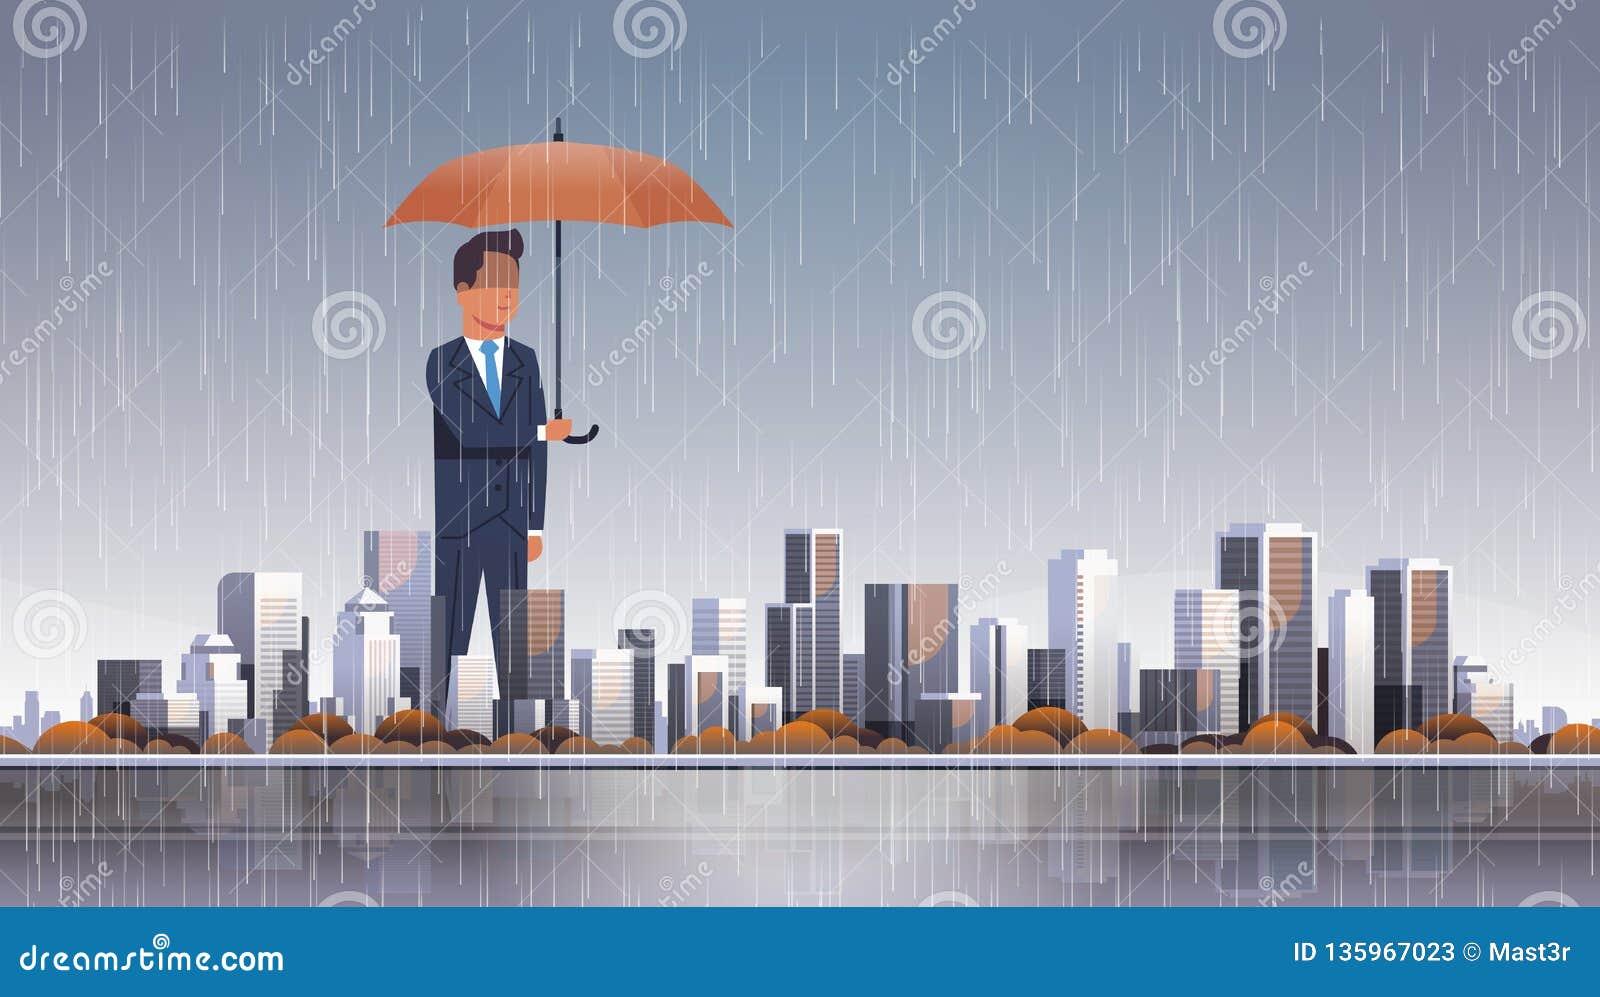 Businessman holding umbrella at storm huge rain business protection concept over big modern city building skyscraper